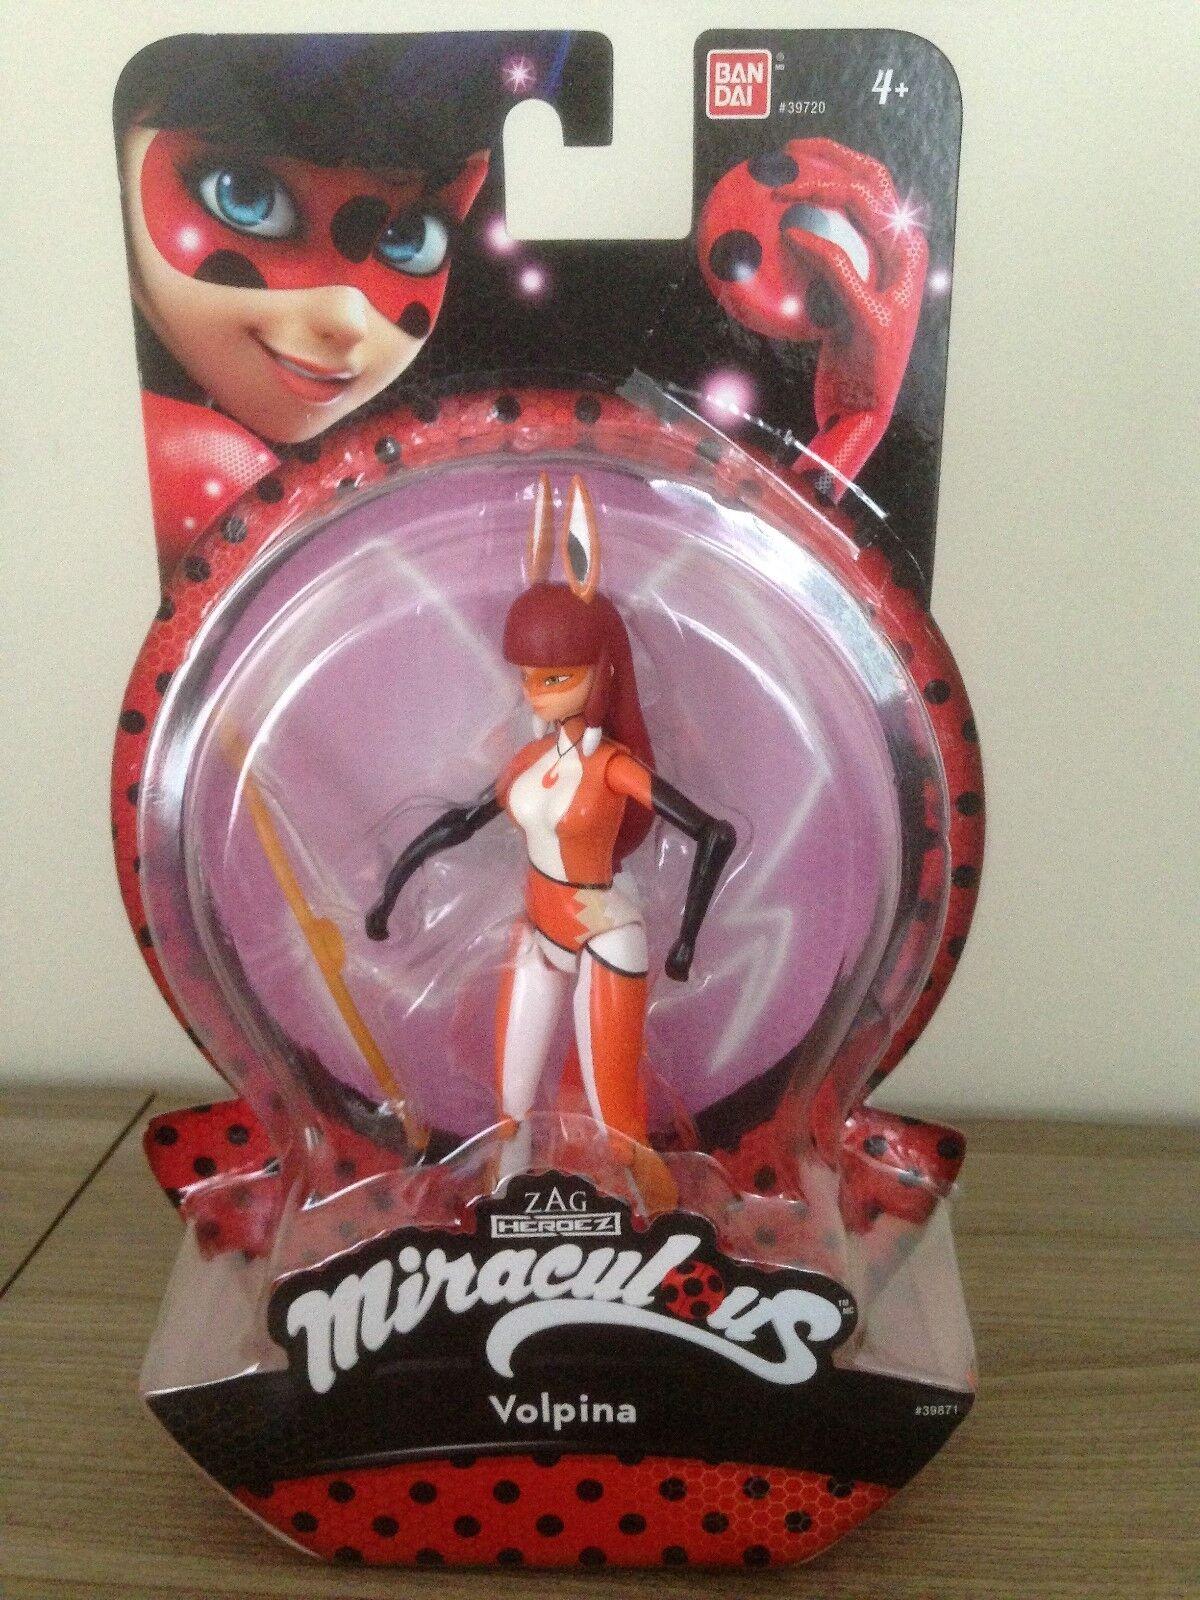 Bandai Zag Zag Zag Heroez Miraculous VOLPINA 15cm   5'' Action FIgure New 03d447